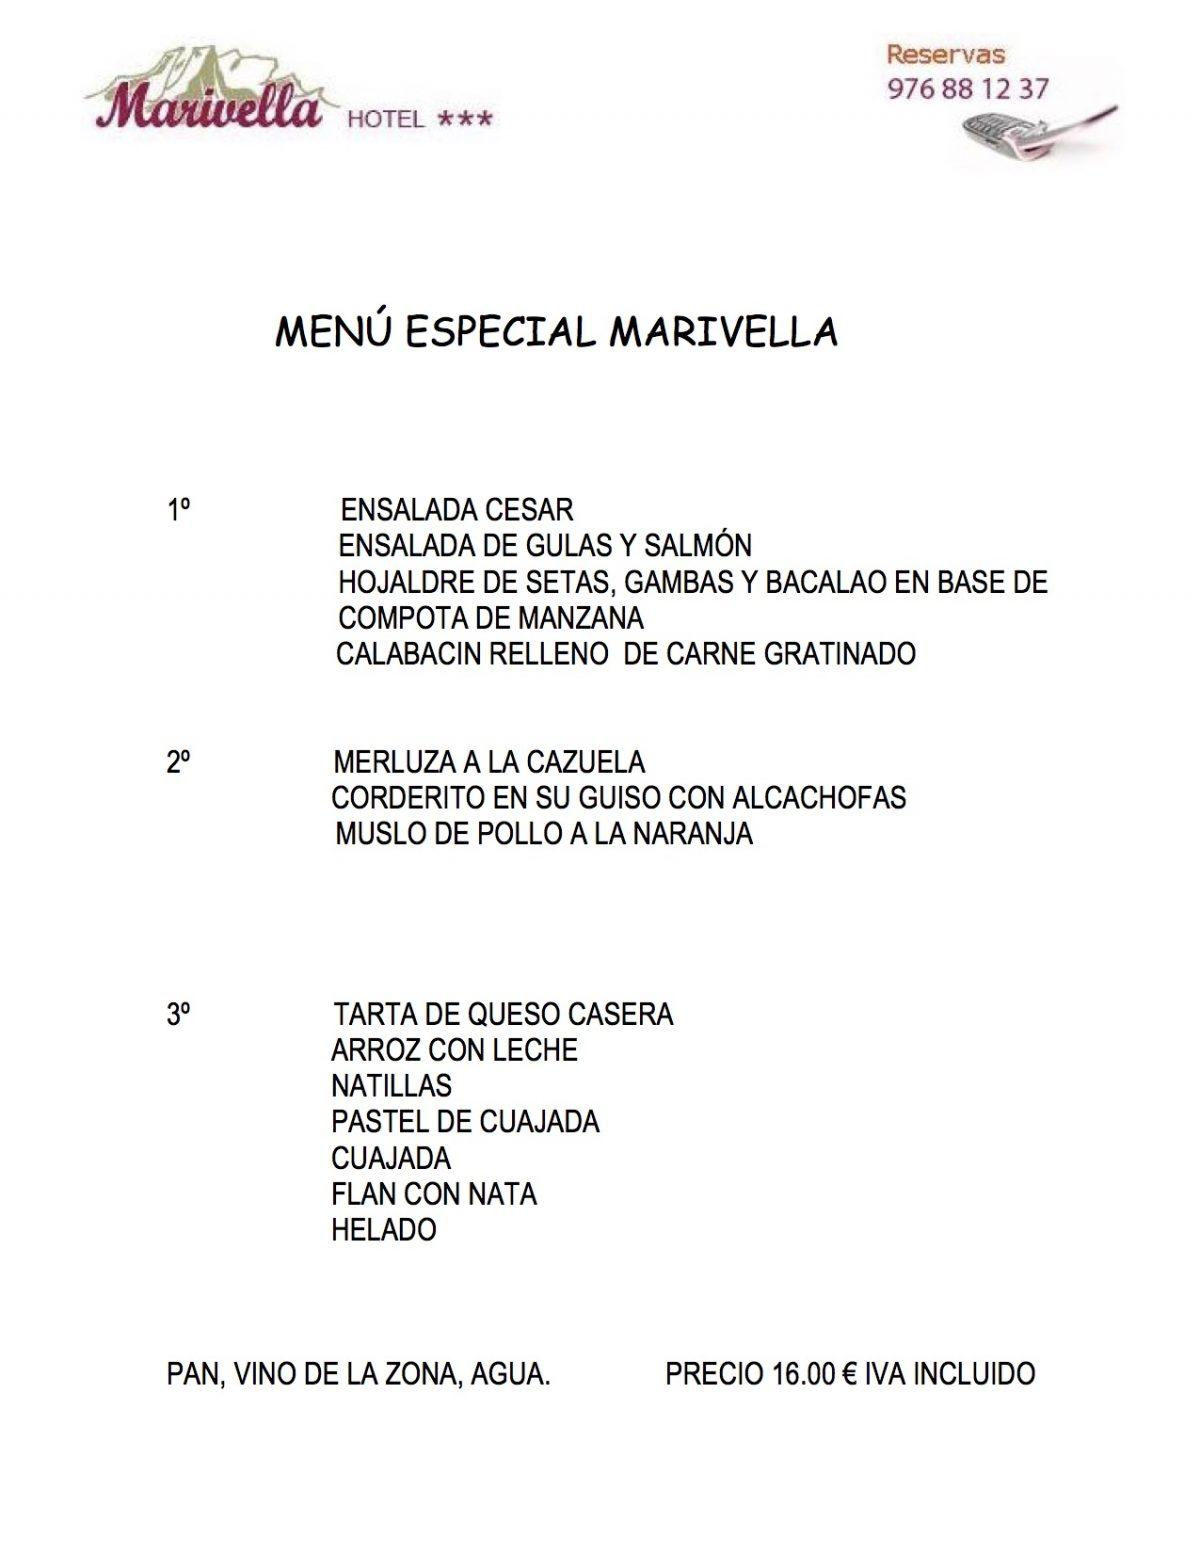 MENU-ESPECIAL-MARIVELLA-MUSLO-DE-POLLO-A-LA-NARAN-060517-1200x1553.jpg